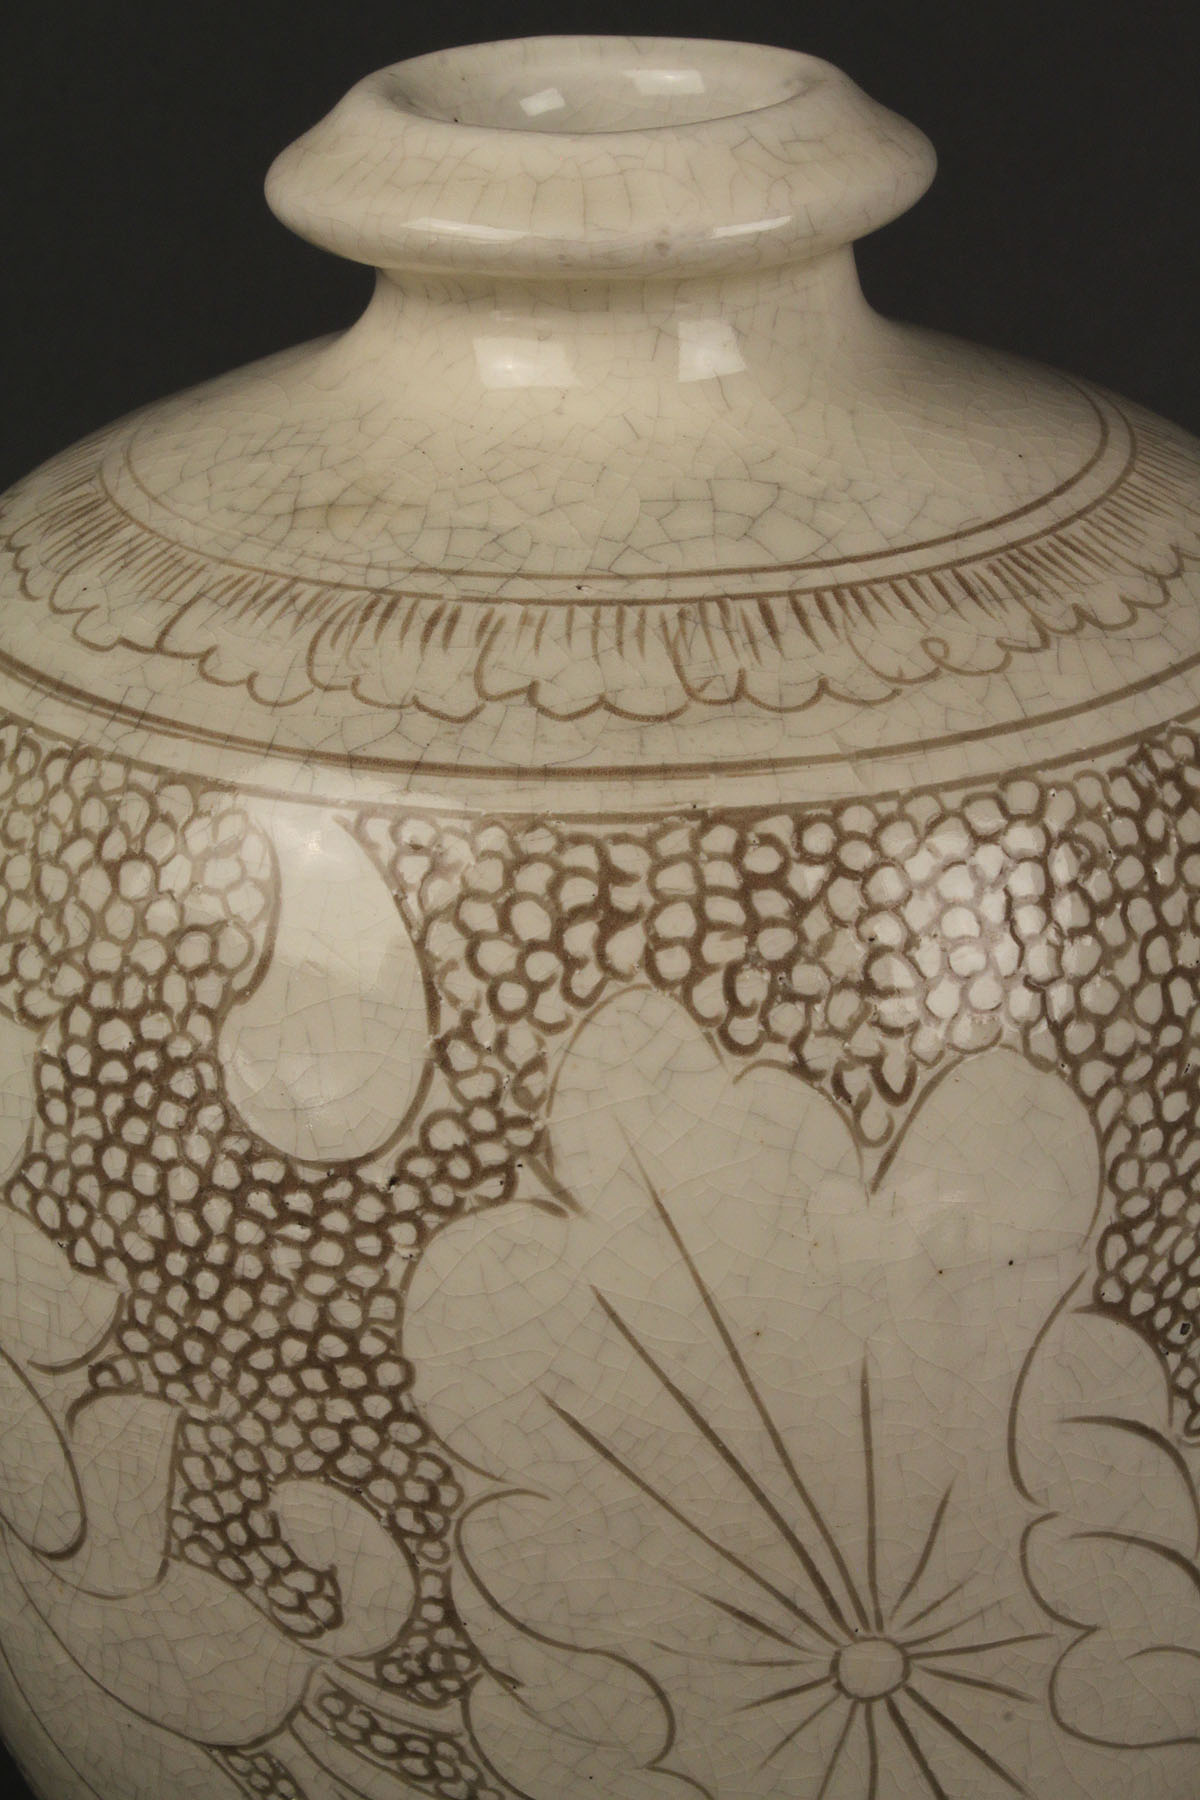 Lot 258 Chinese Tz U Chou Ware Vase